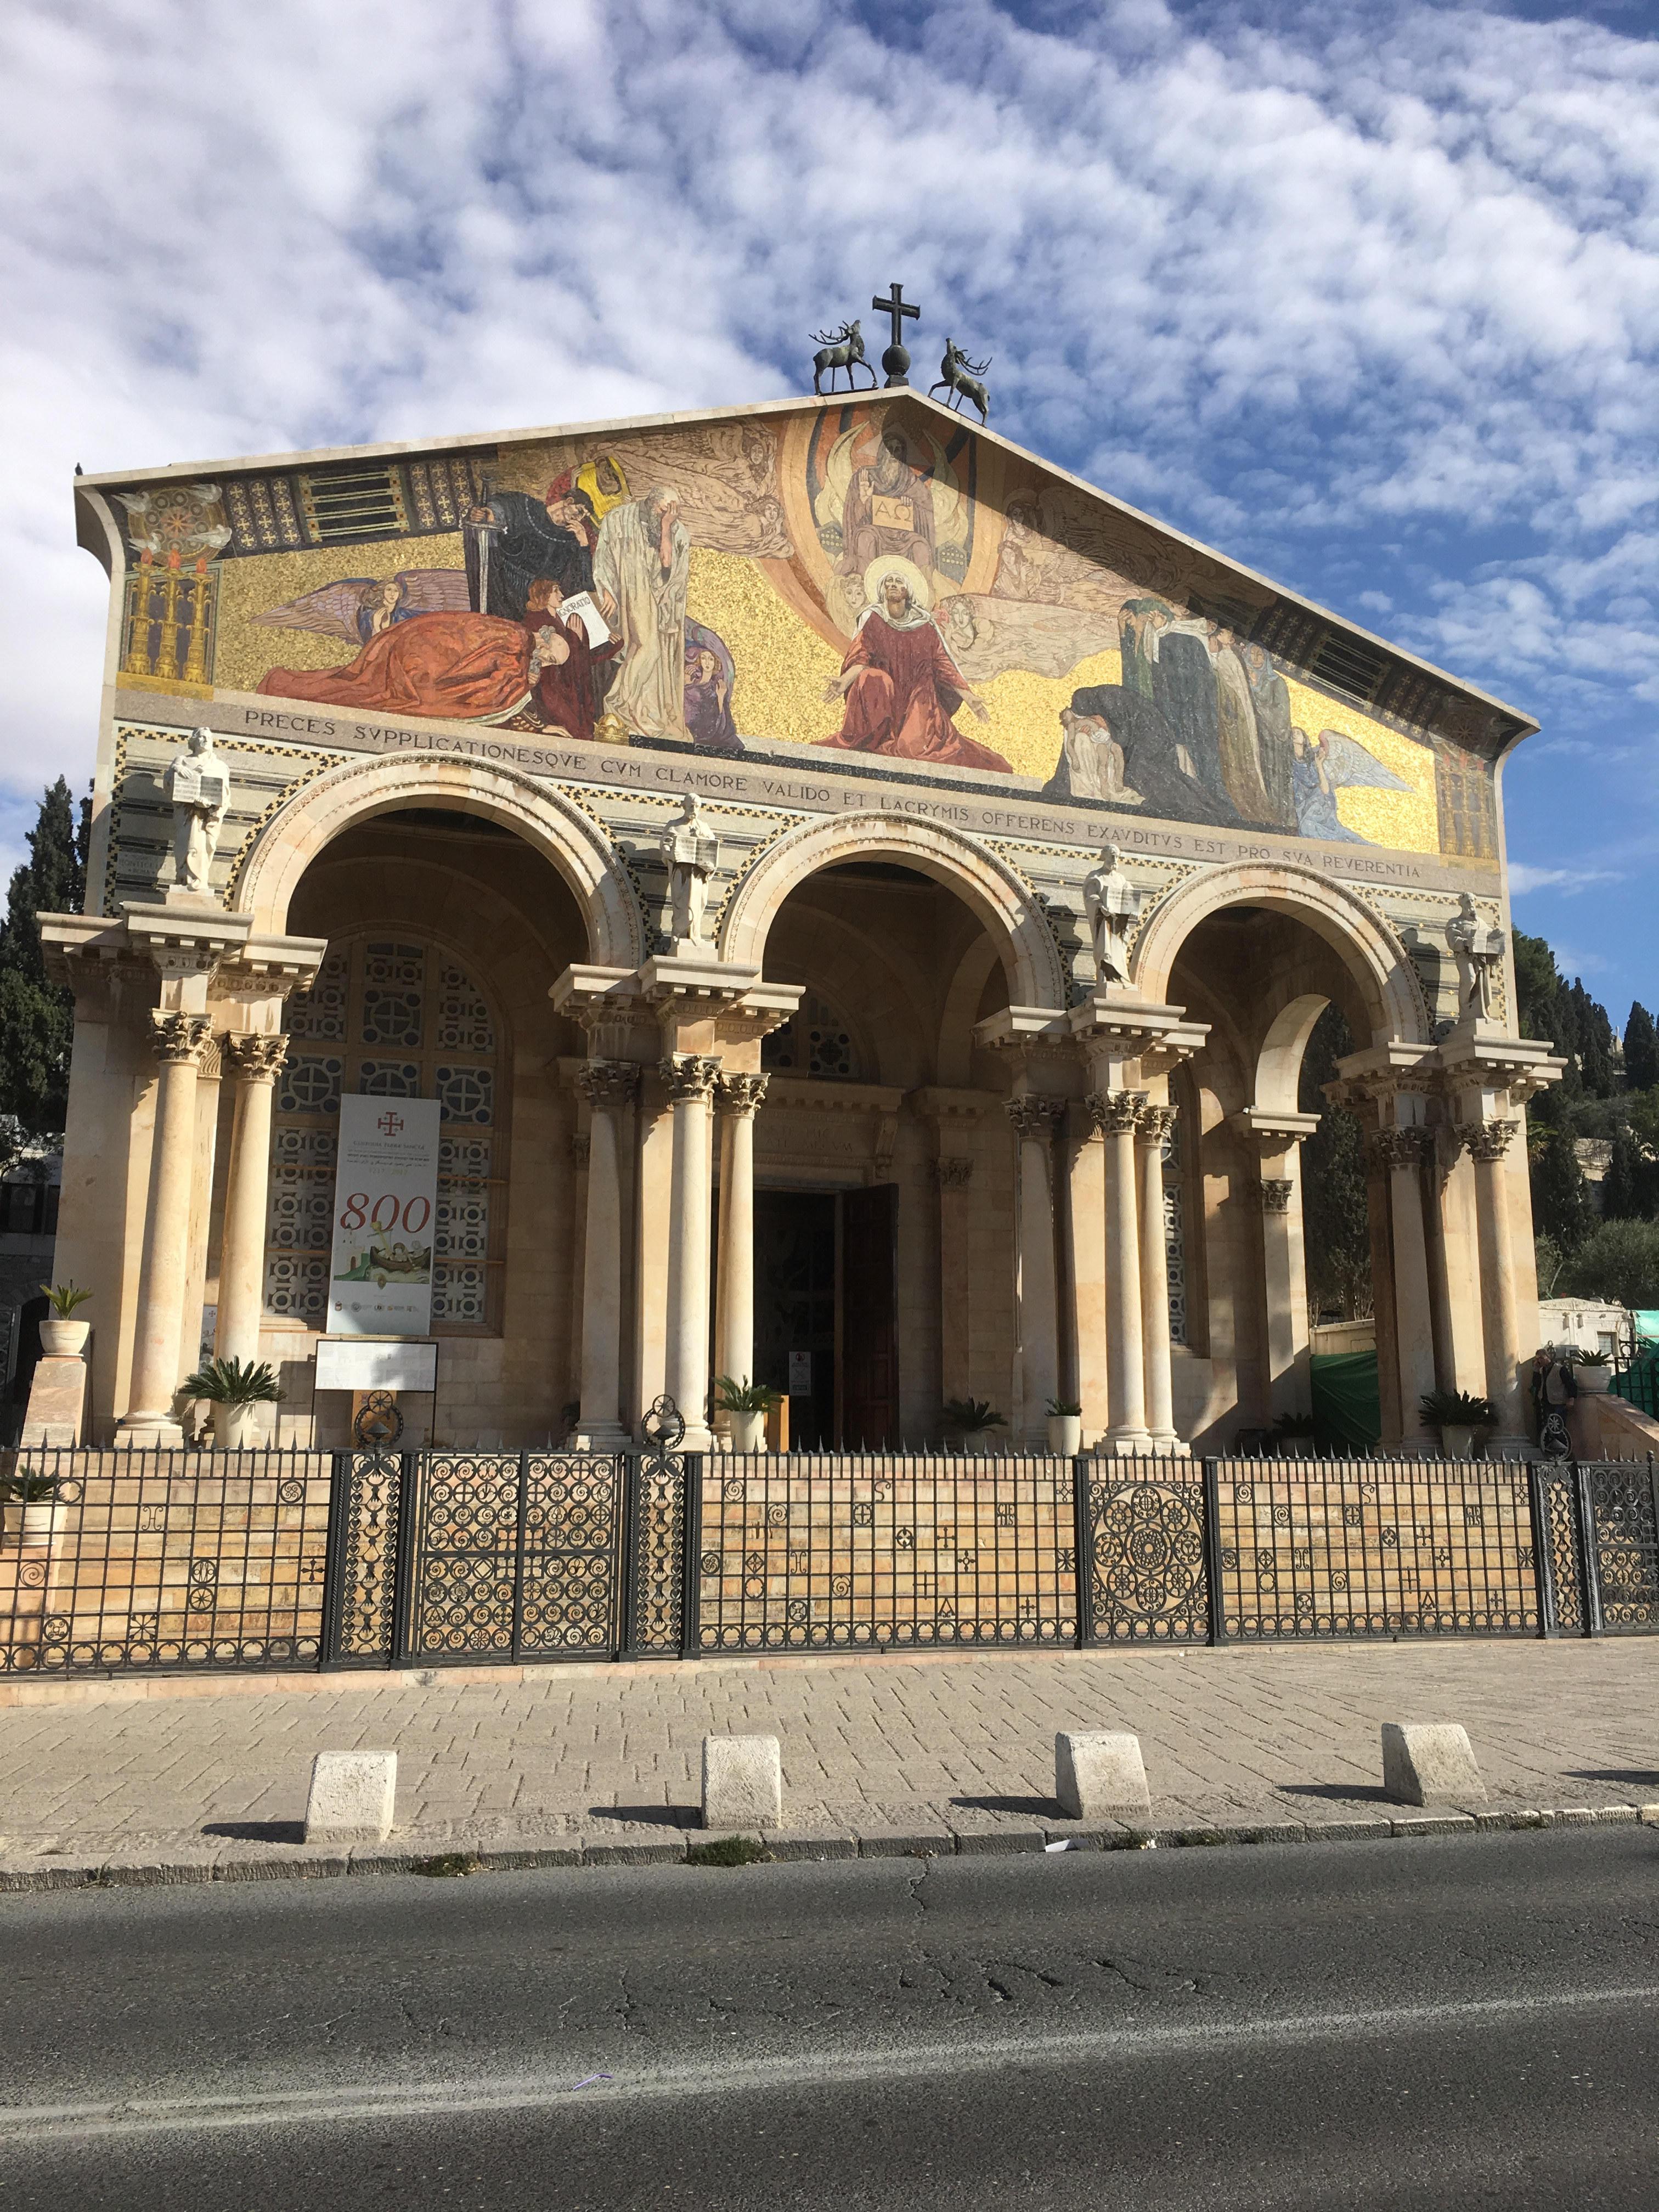 Basilica of the Agony